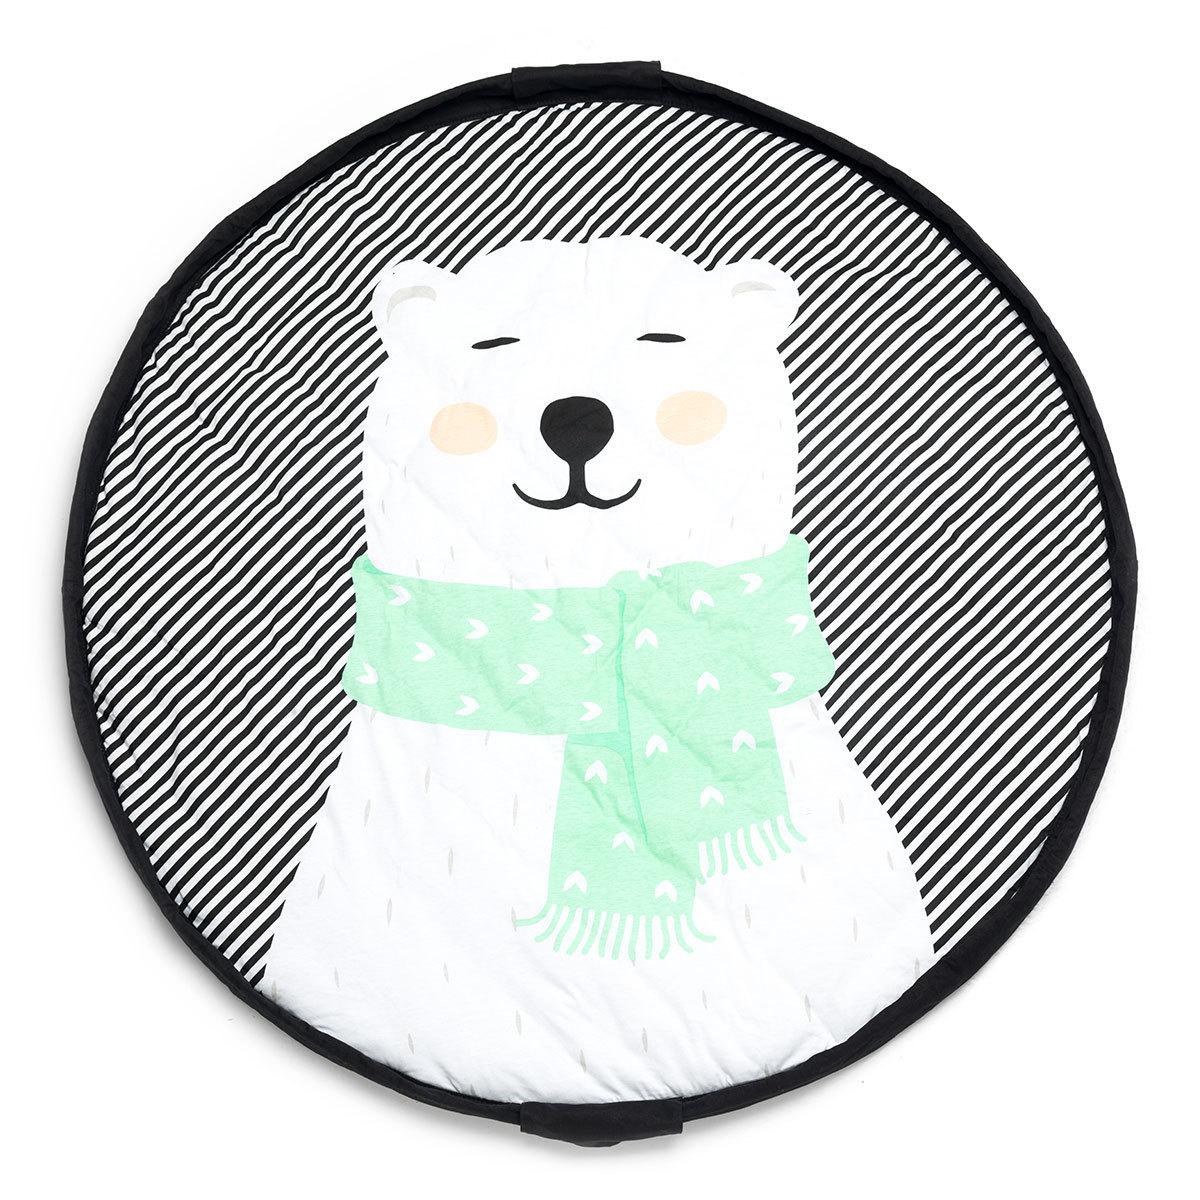 Rangement jouet Sac à Jouet / Tapis de Jeu Ø 120 cm - Polar Bear Sac à Jouet / Tapis de Jeu Ø 120 cm - Polar Bear